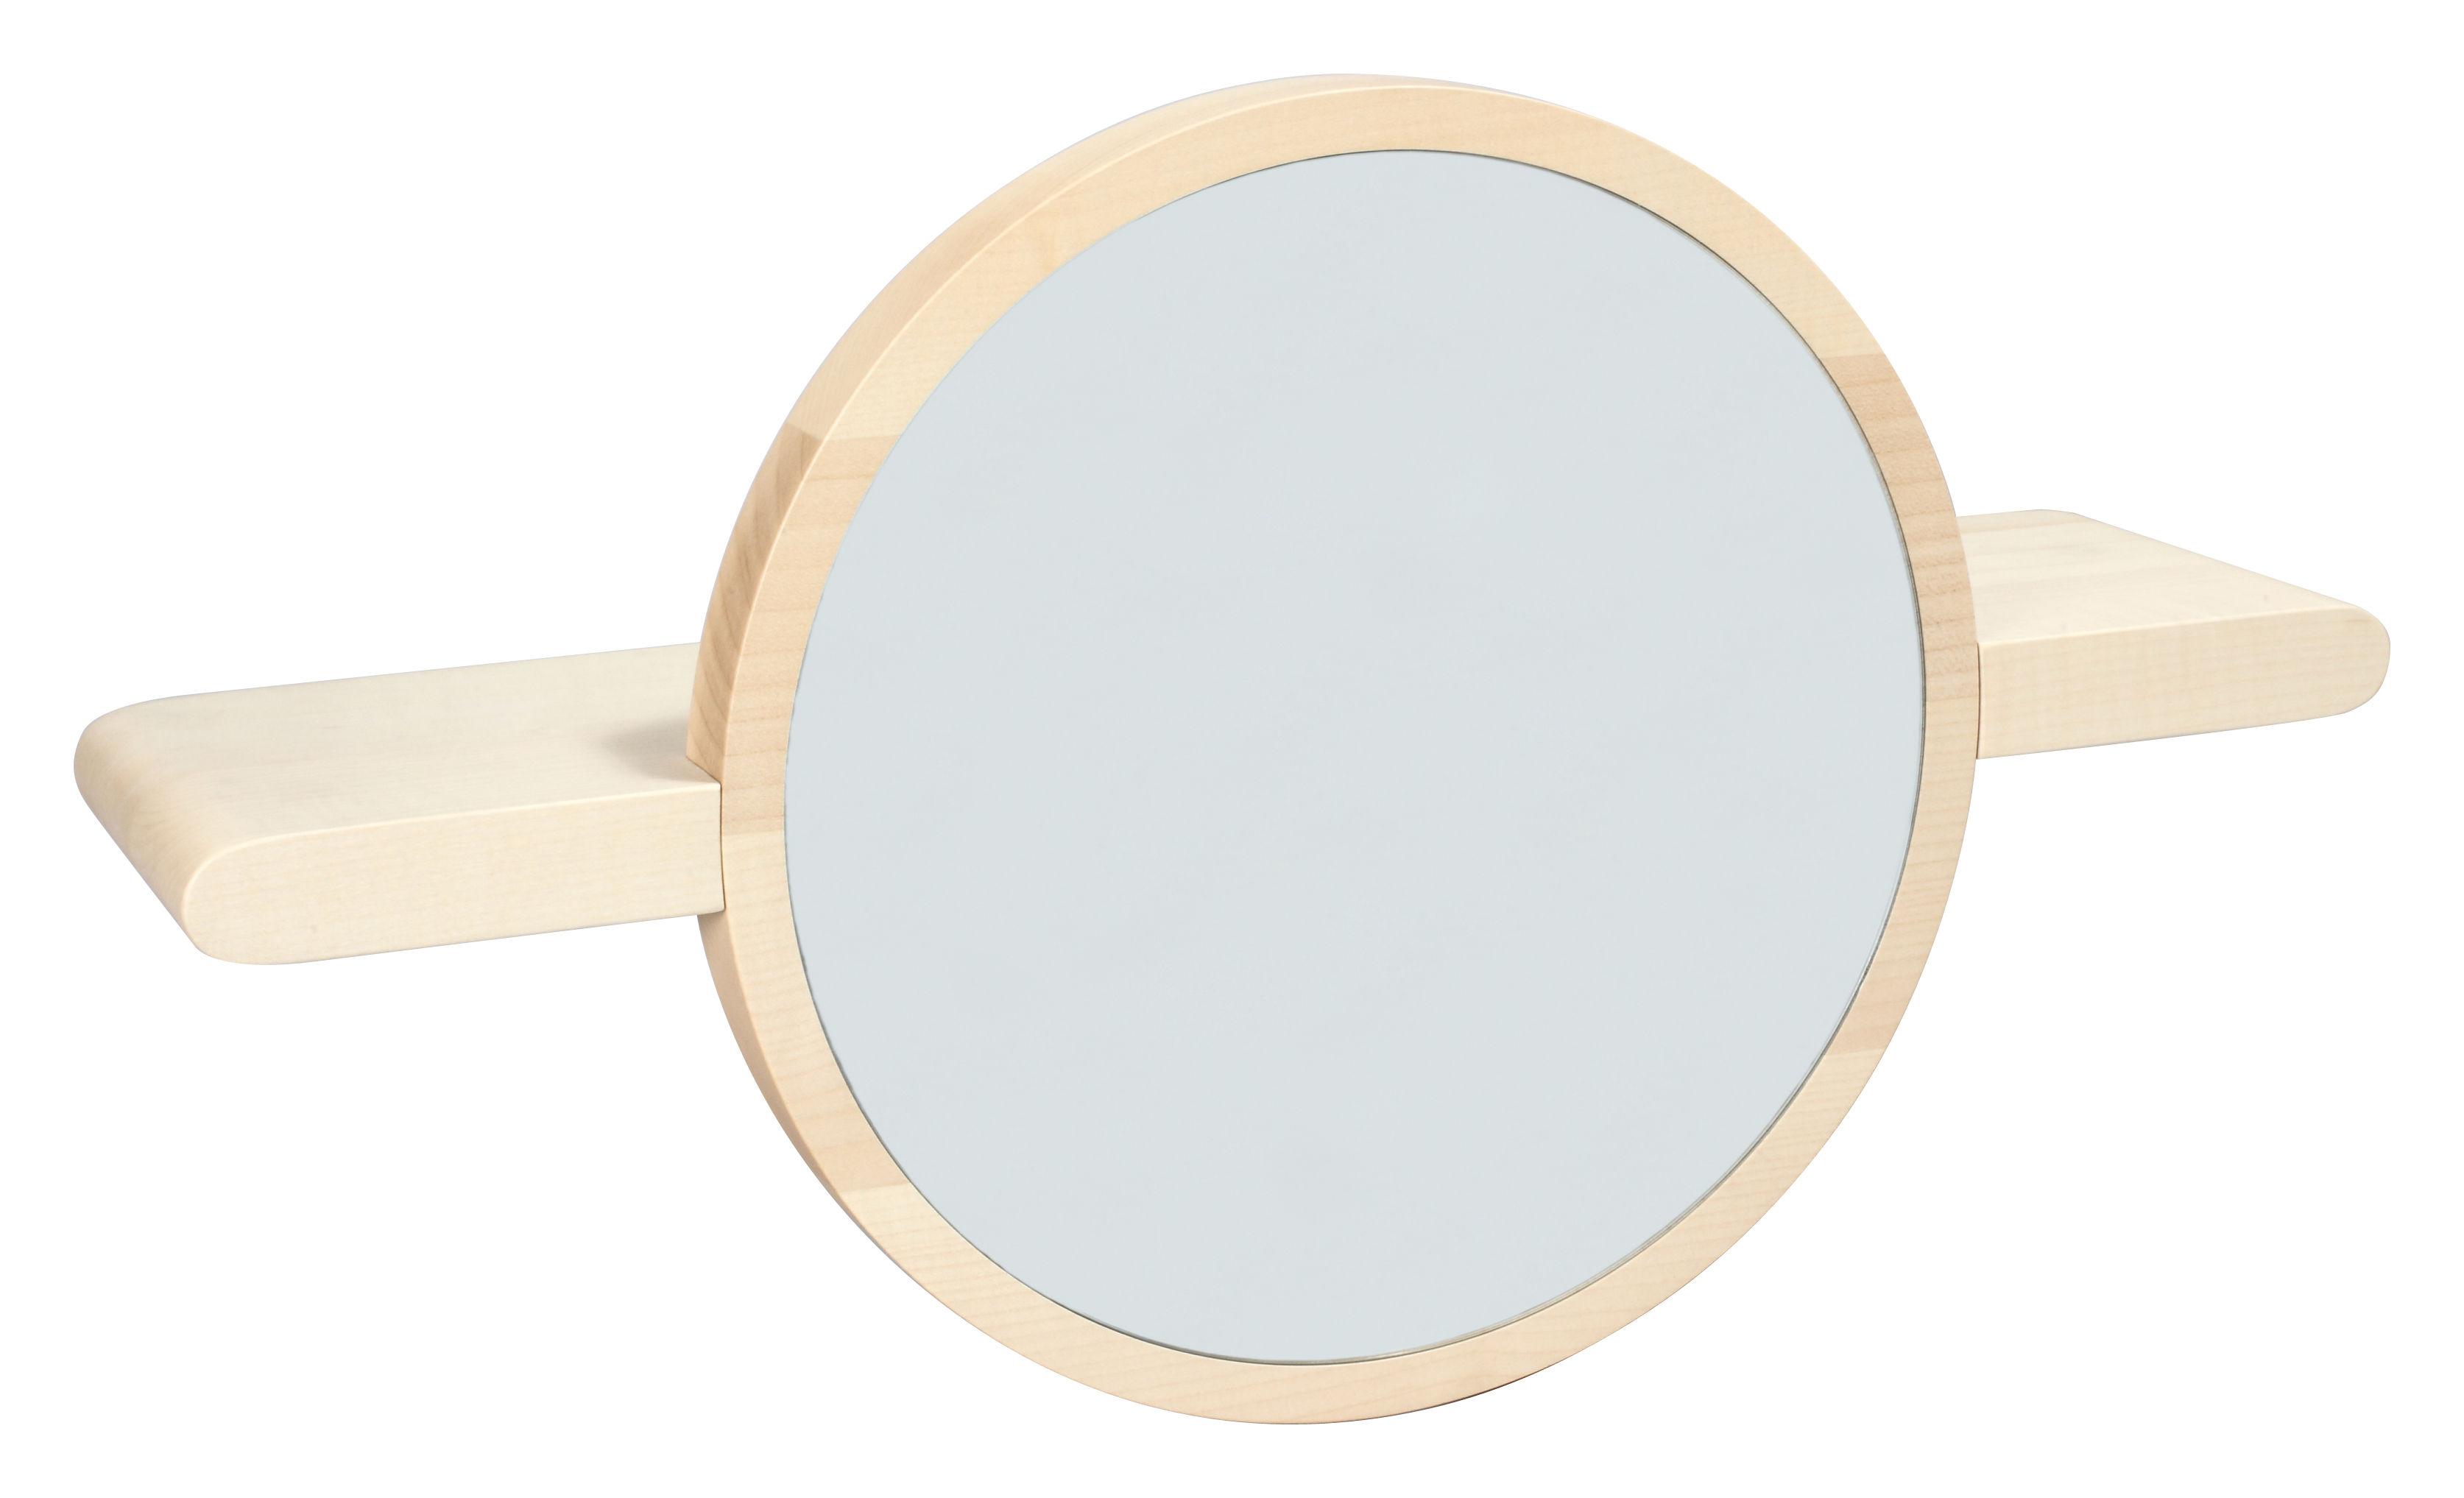 etag re mirette miroir rond l 60 cm bois naturel made in design editions by oxyo. Black Bedroom Furniture Sets. Home Design Ideas